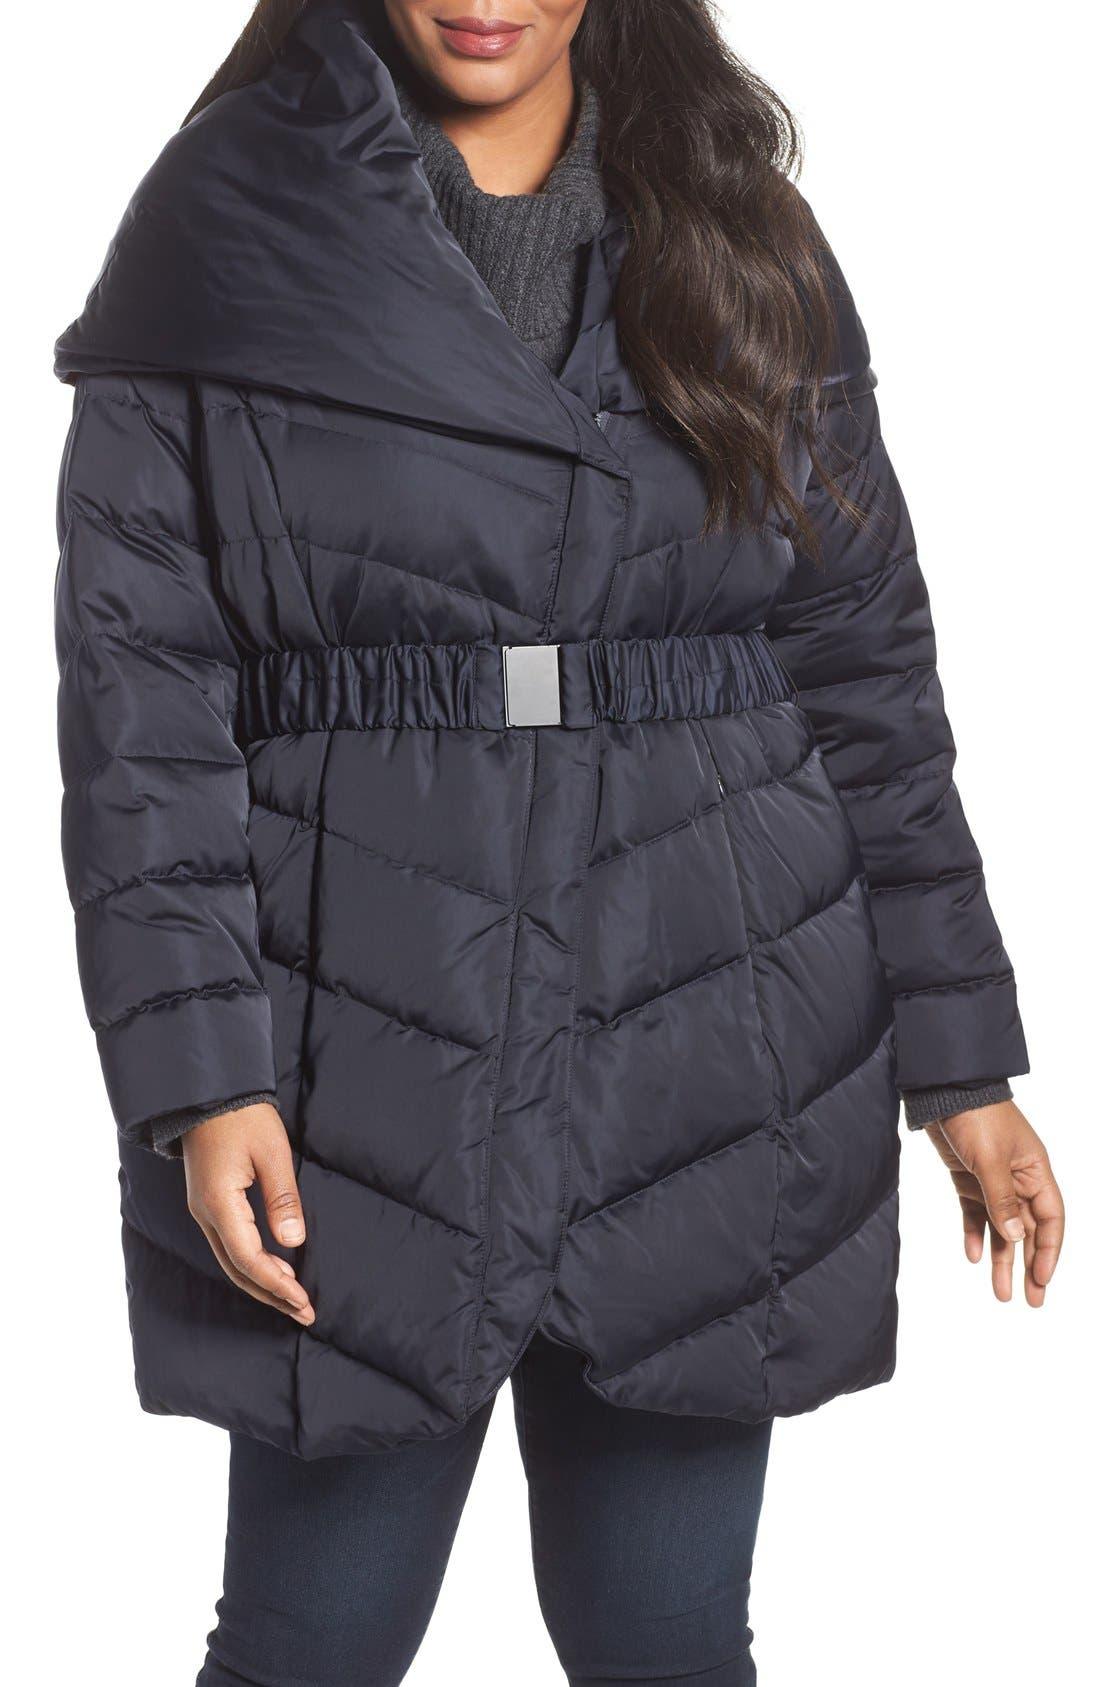 Alternate Image 1 Selected - Tahari Matilda Shawl Collar Quilted Coat (Plus Size)